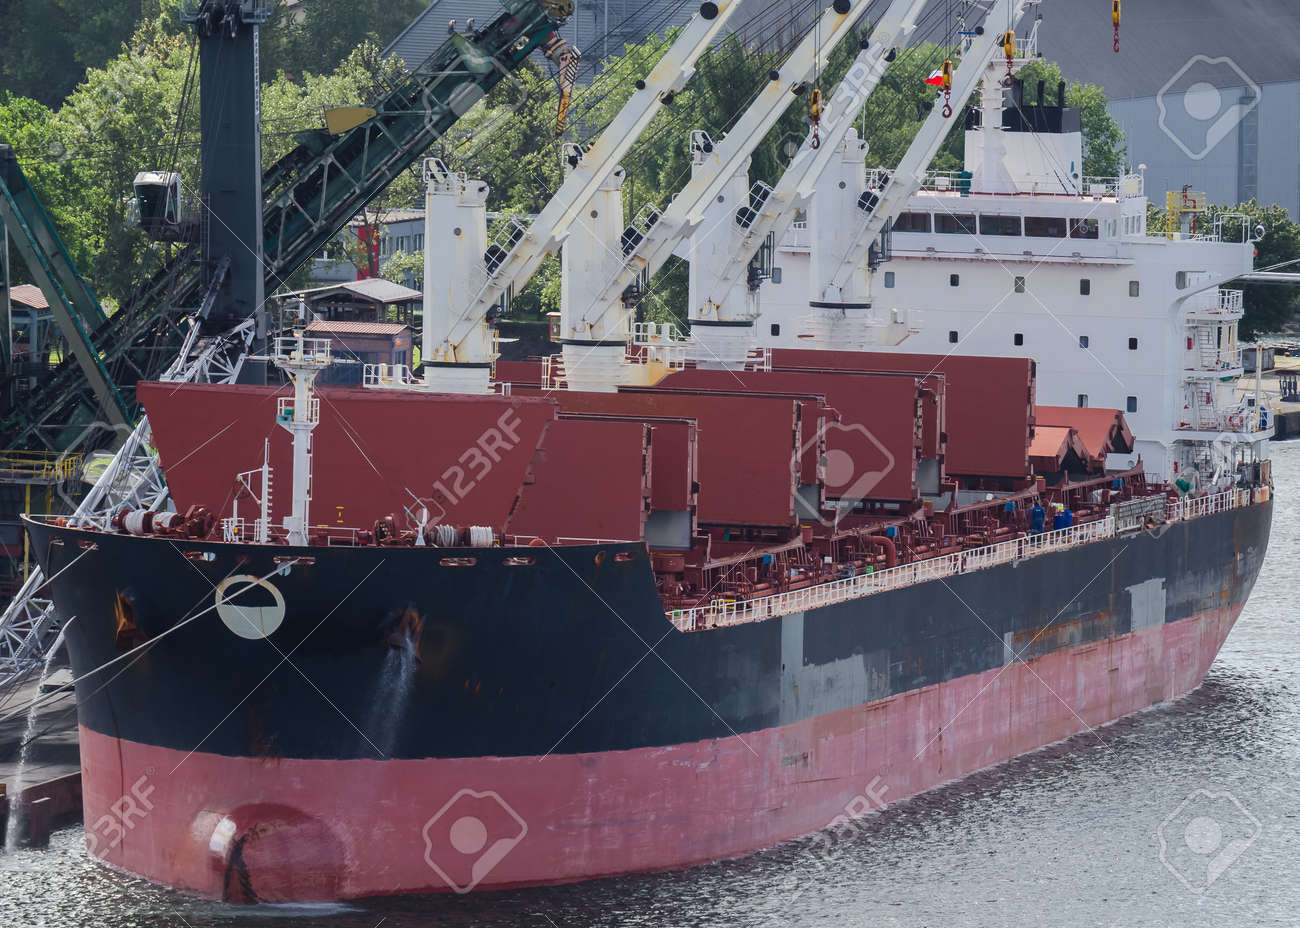 MARITIME TRANSPORT - Merchant vessel in seaport - 168433592